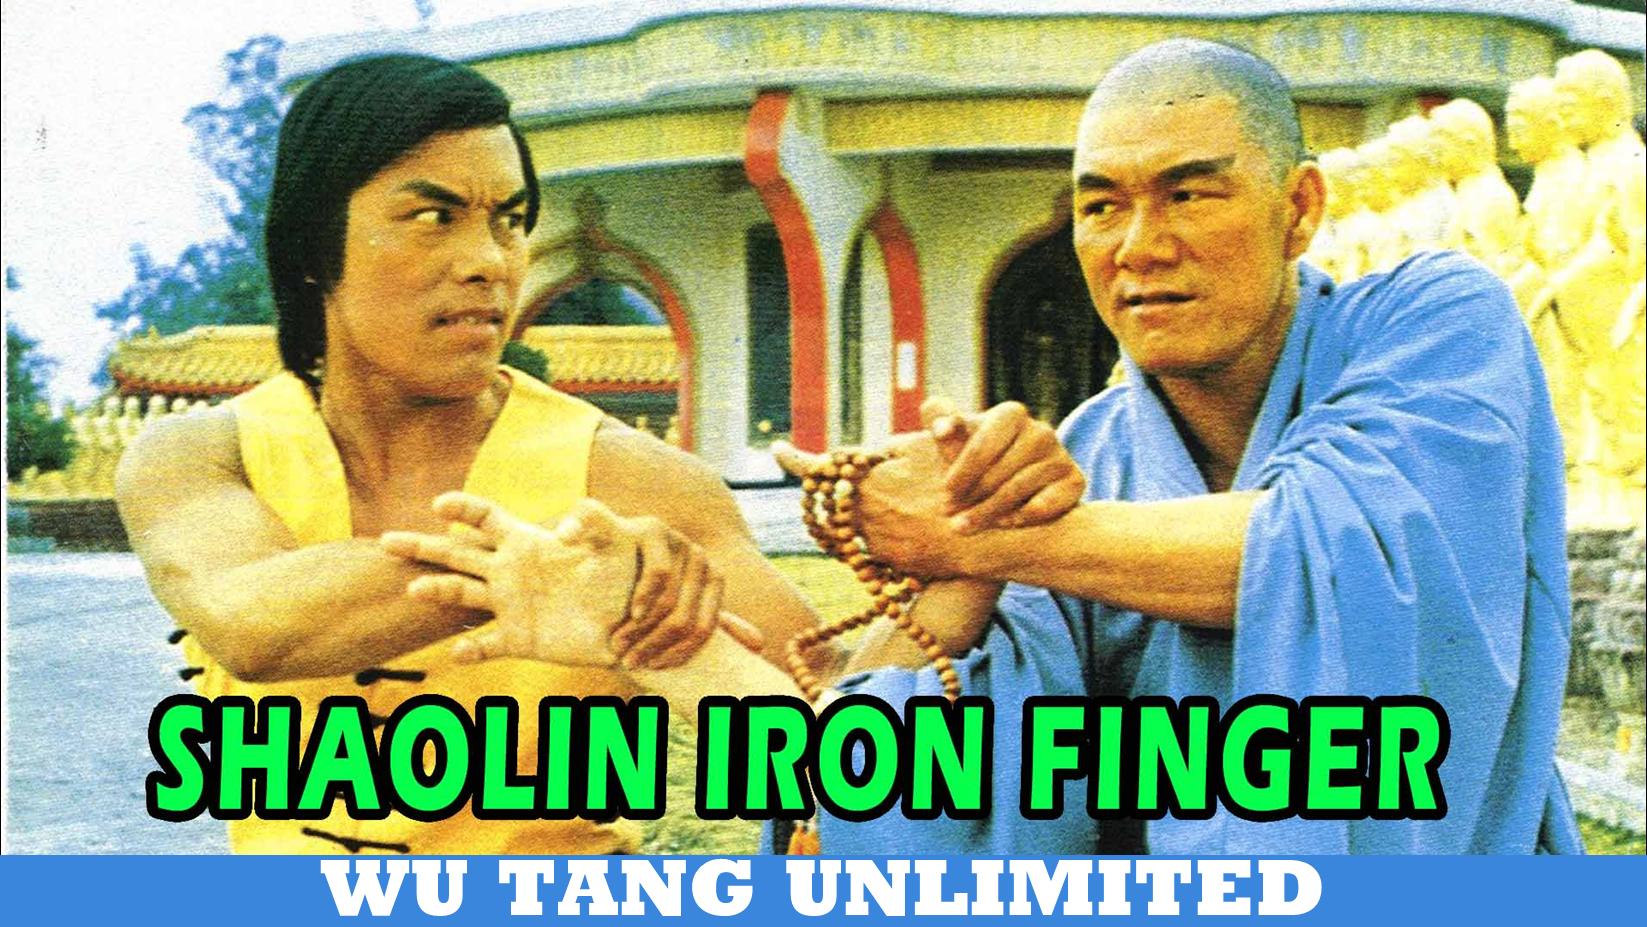 Shaolin Iron Finger aka Renegade Master